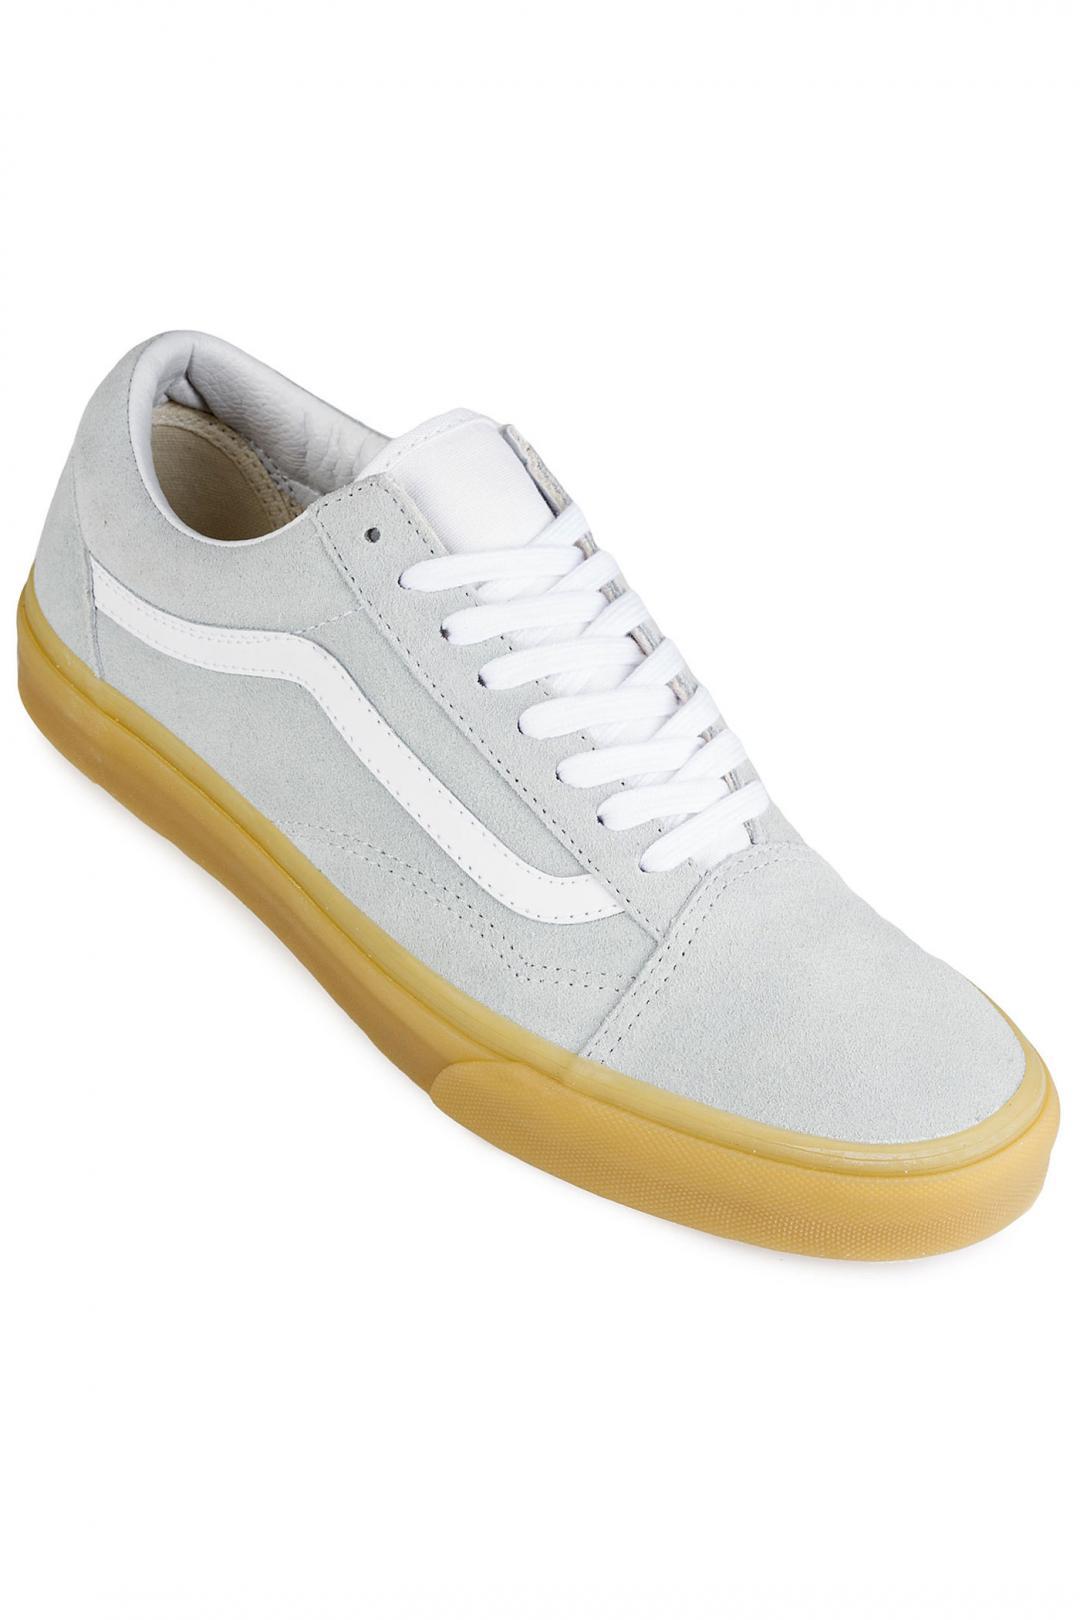 Uomo Vans Old Skool double light metal   Sneakers low top